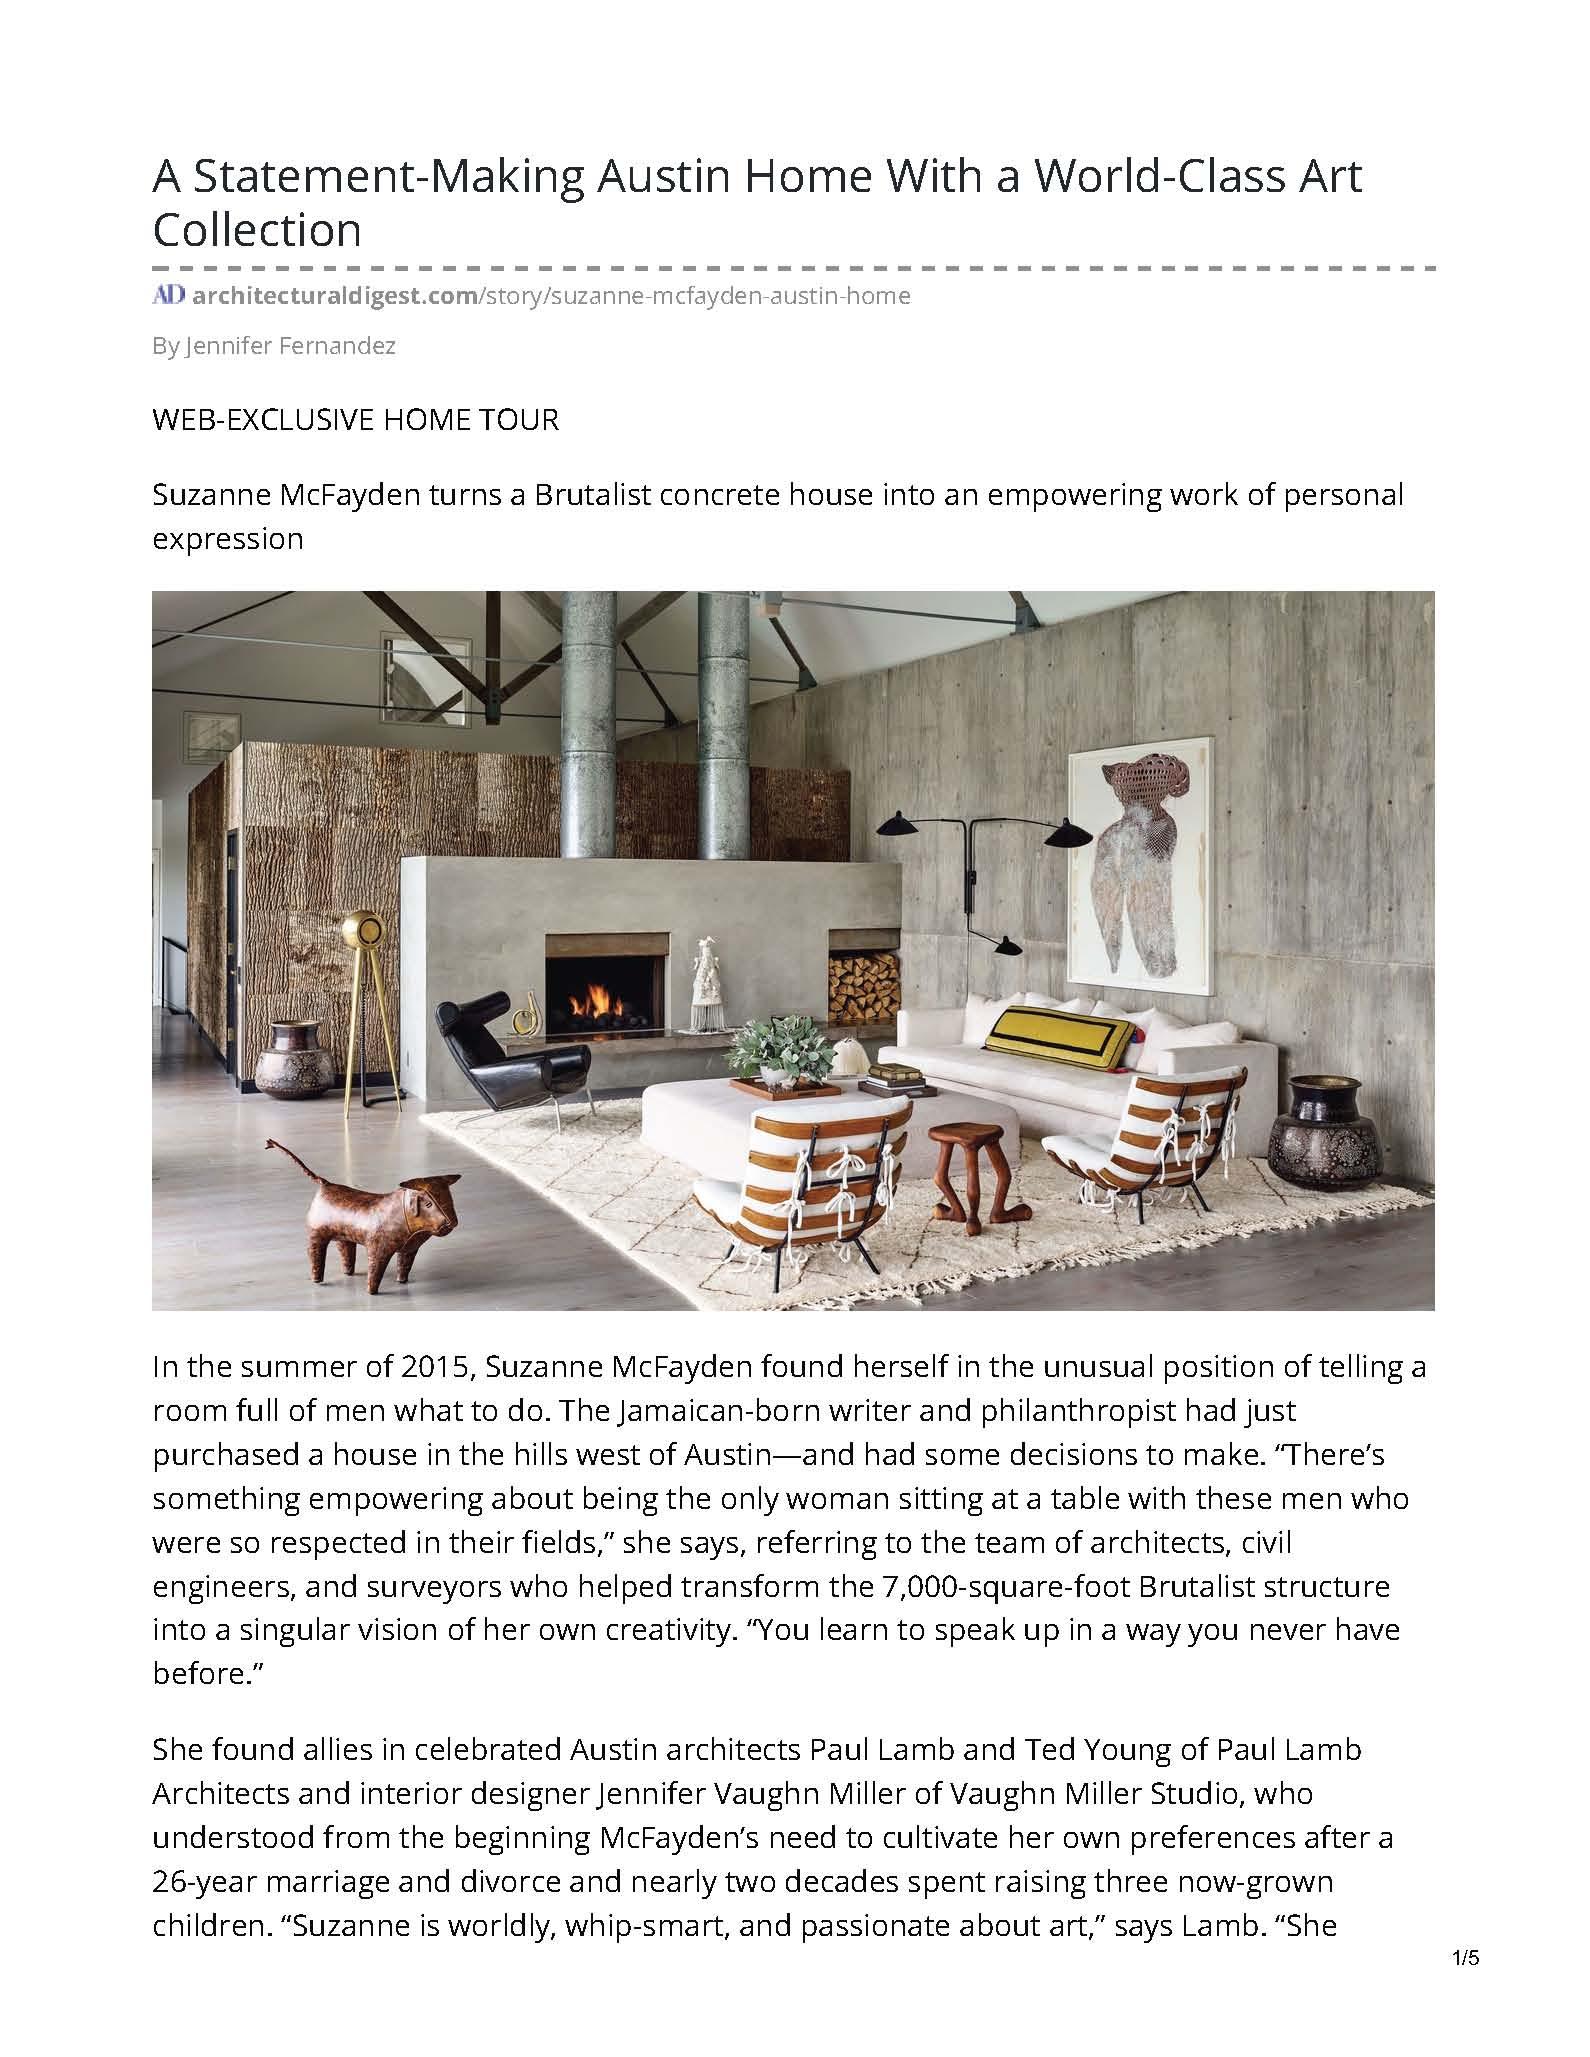 architecturaldigest.com-A Statement-Making Austin Home With a World-Clas..._Page_1.jpg